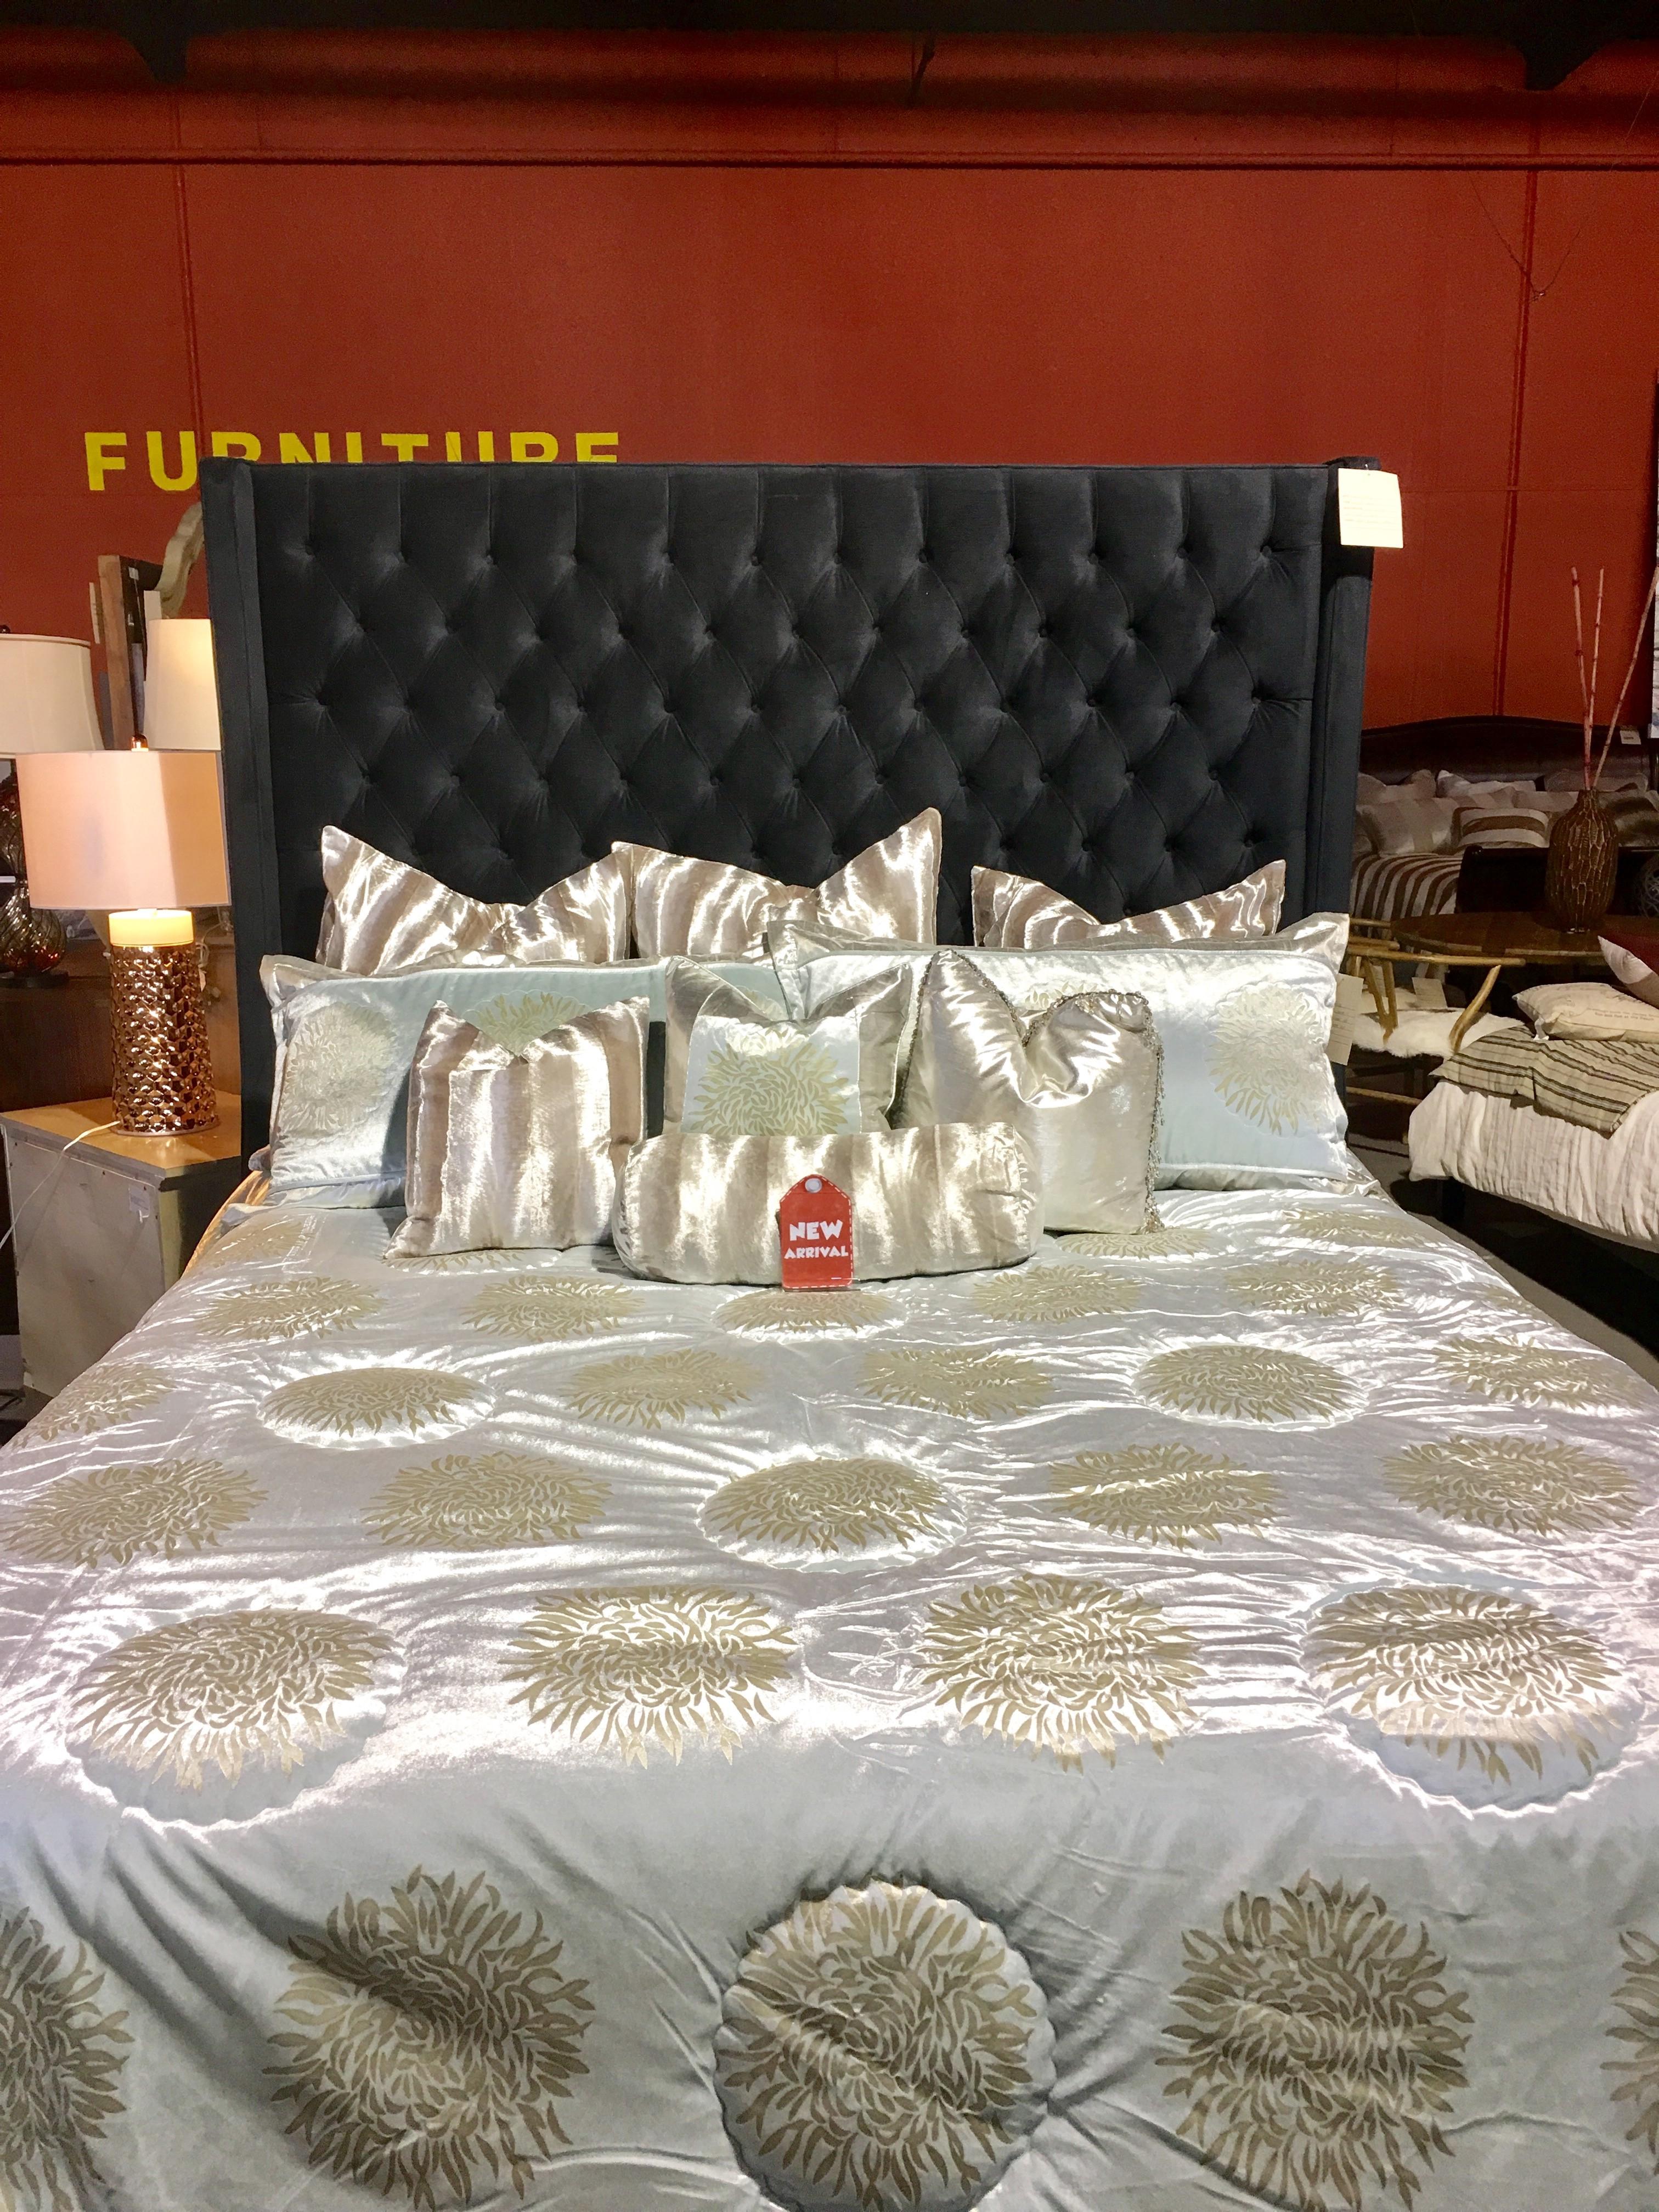 Wickmans Furniture 28448 Roadside Drive Agoura Hills Ca Clothes Posts Mapquest